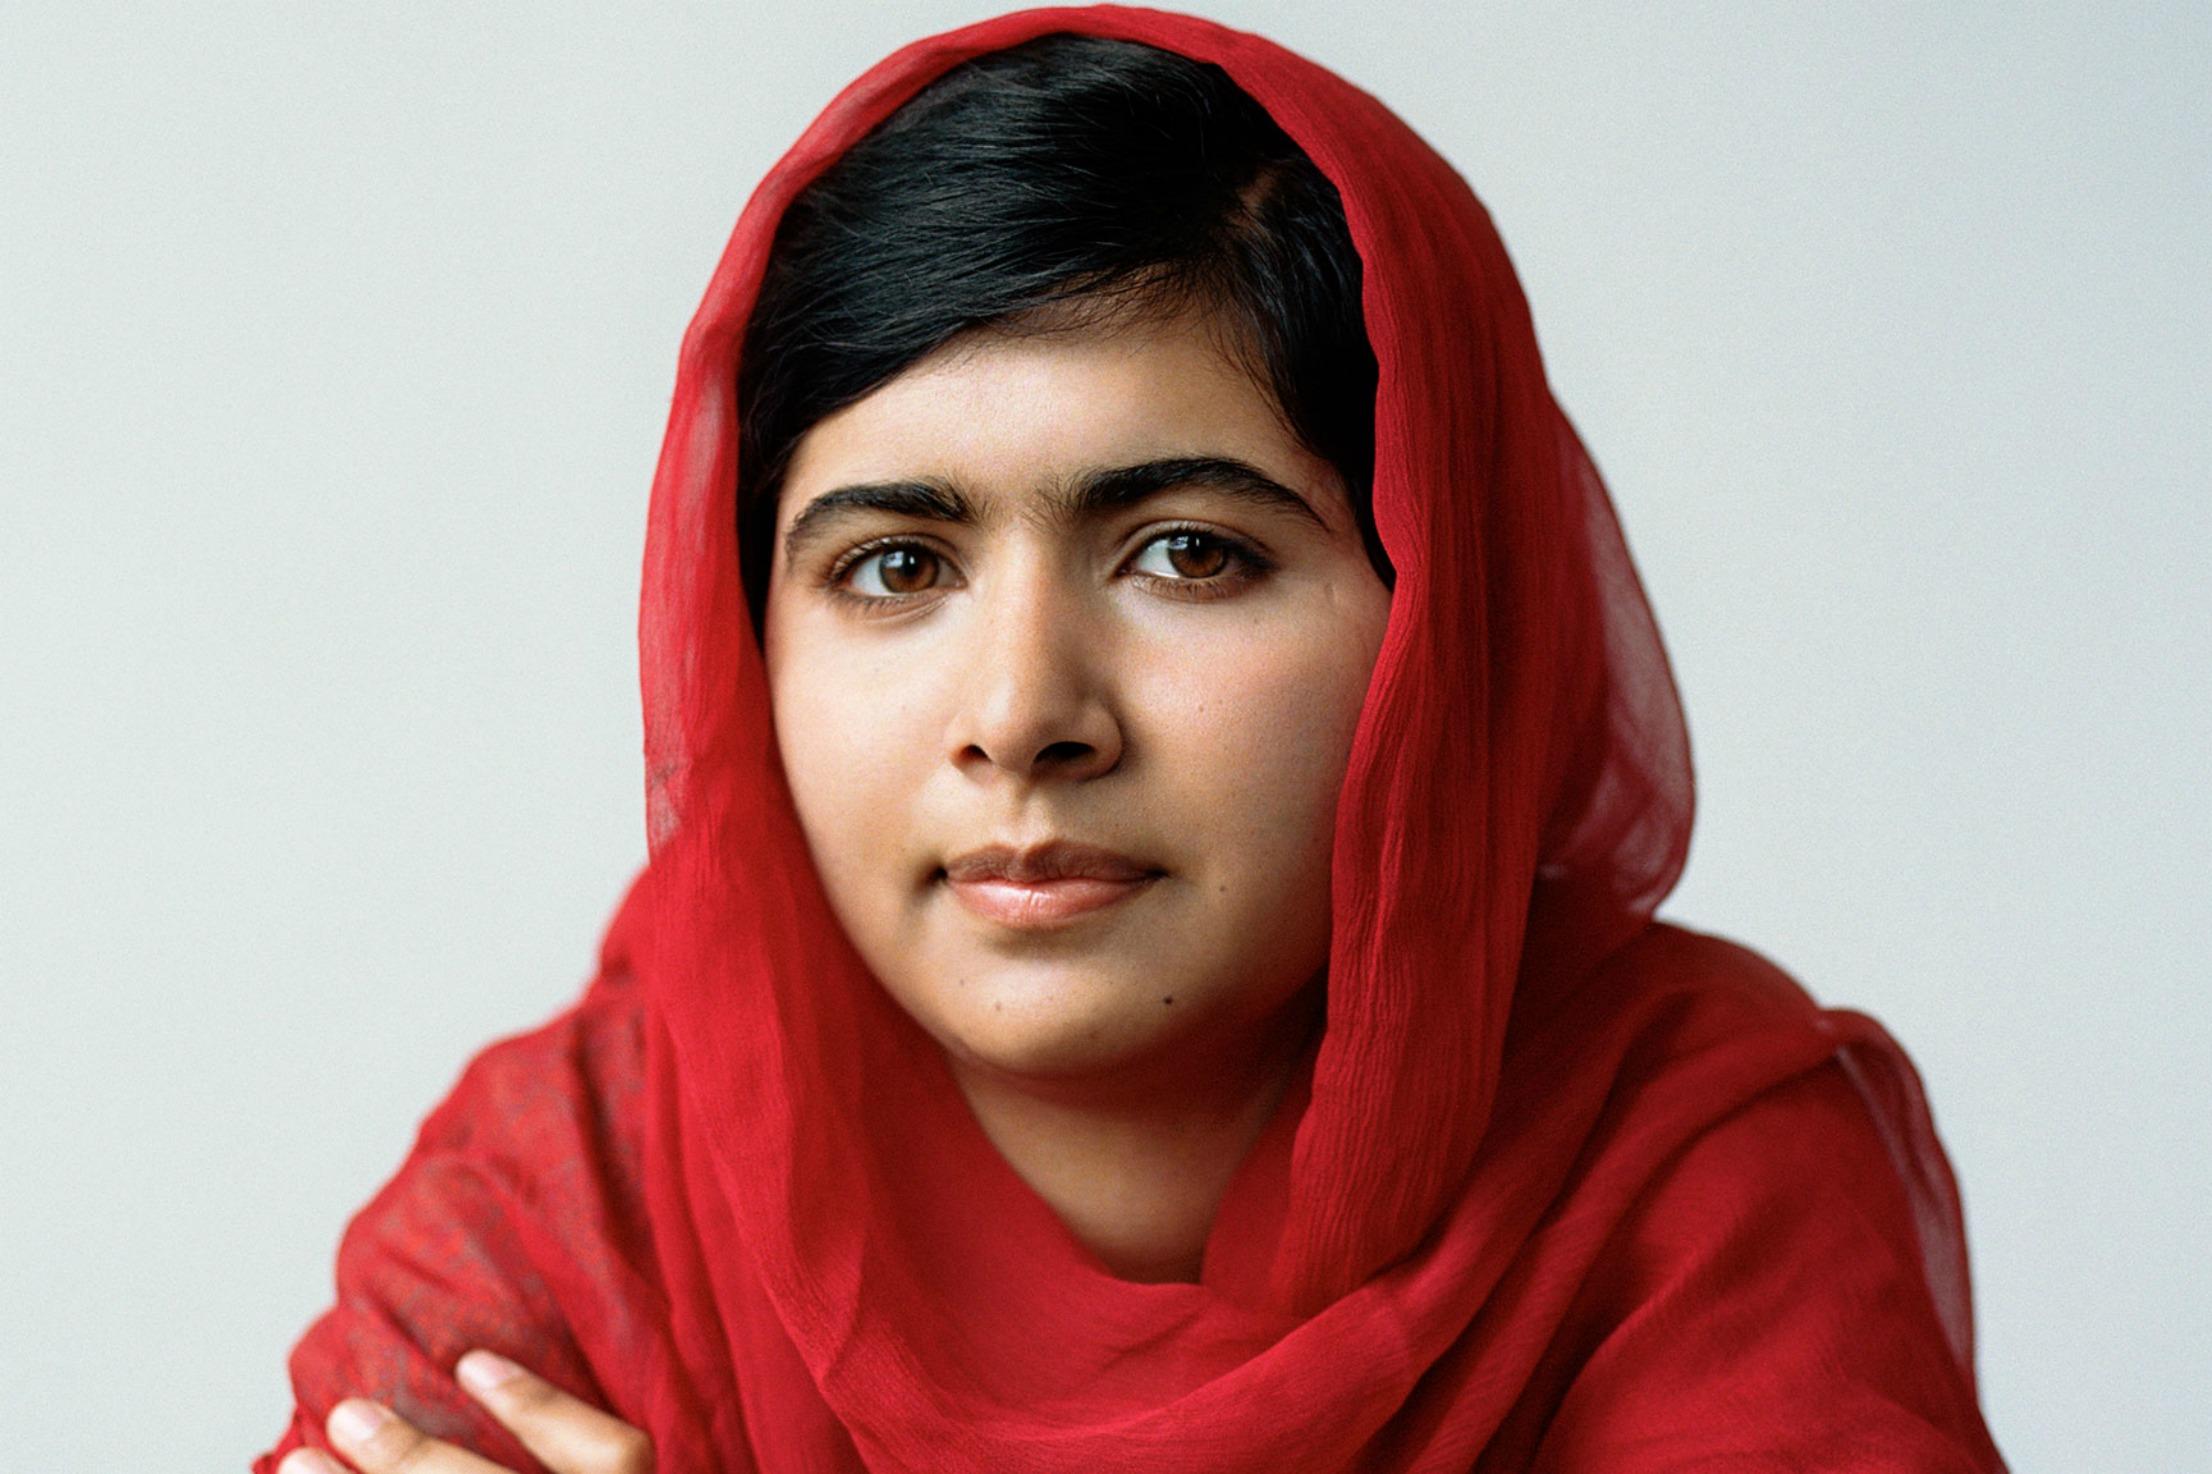 MALALA YOUSAFZAI IS GOING TO OXFORD UNIVERSITY -